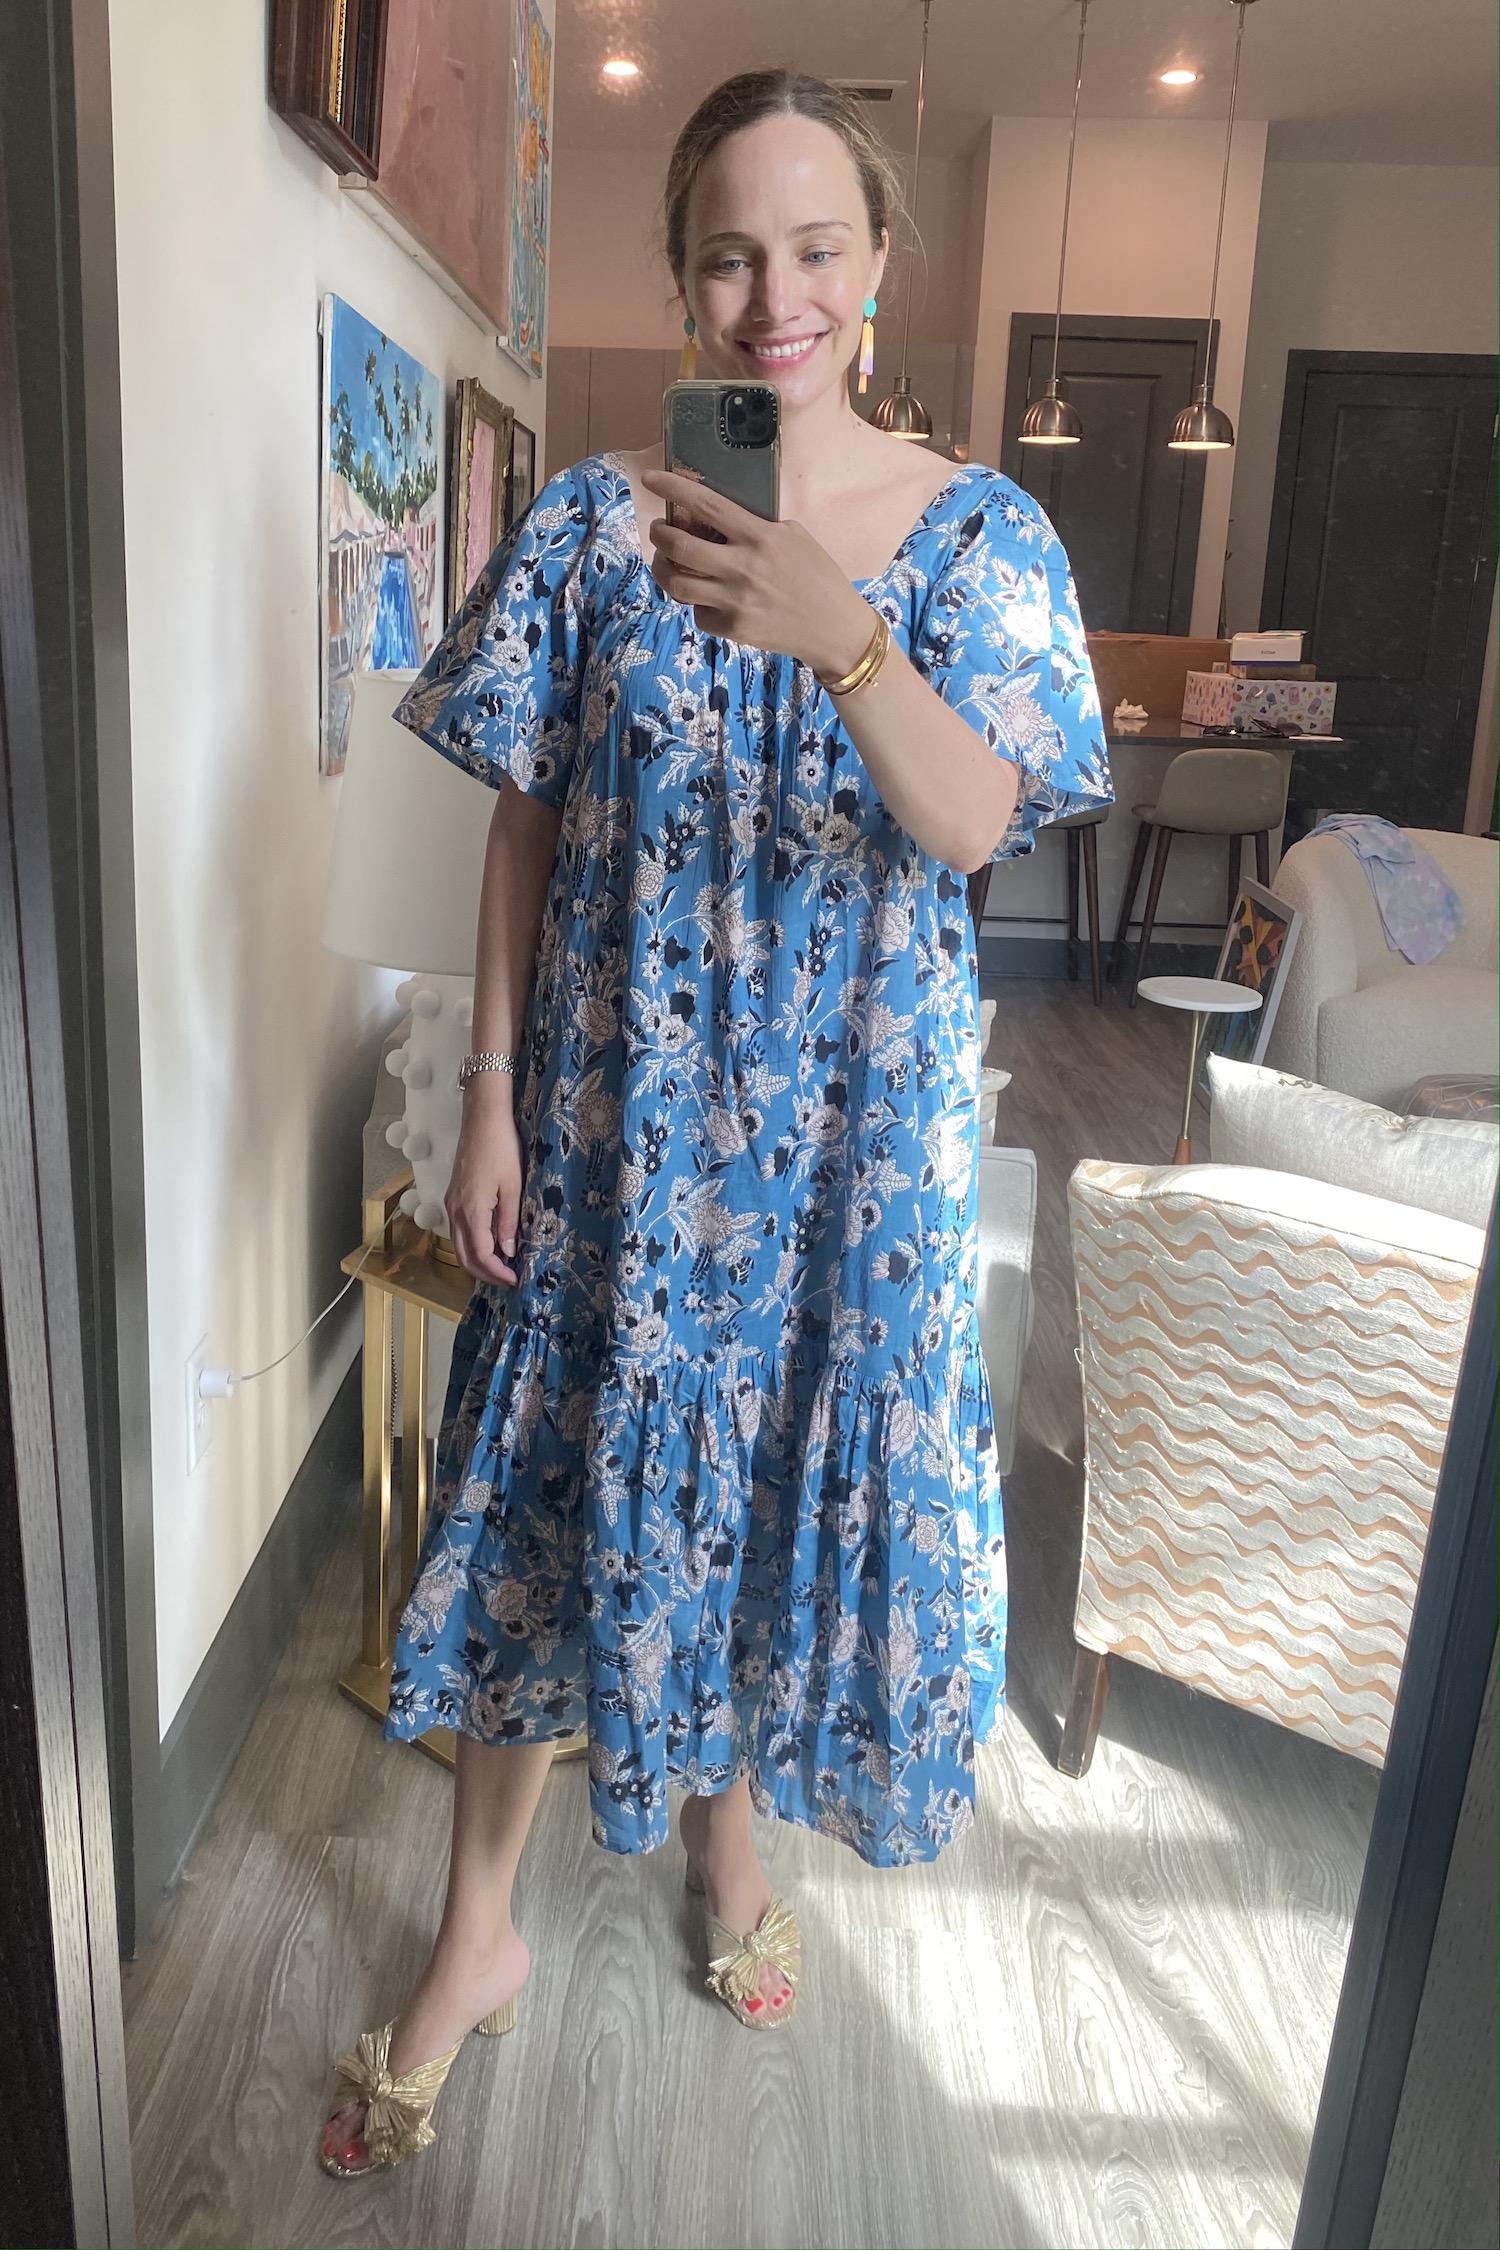 dress from Ophelia & Indigo | What I Wore Last Week 5.28.21